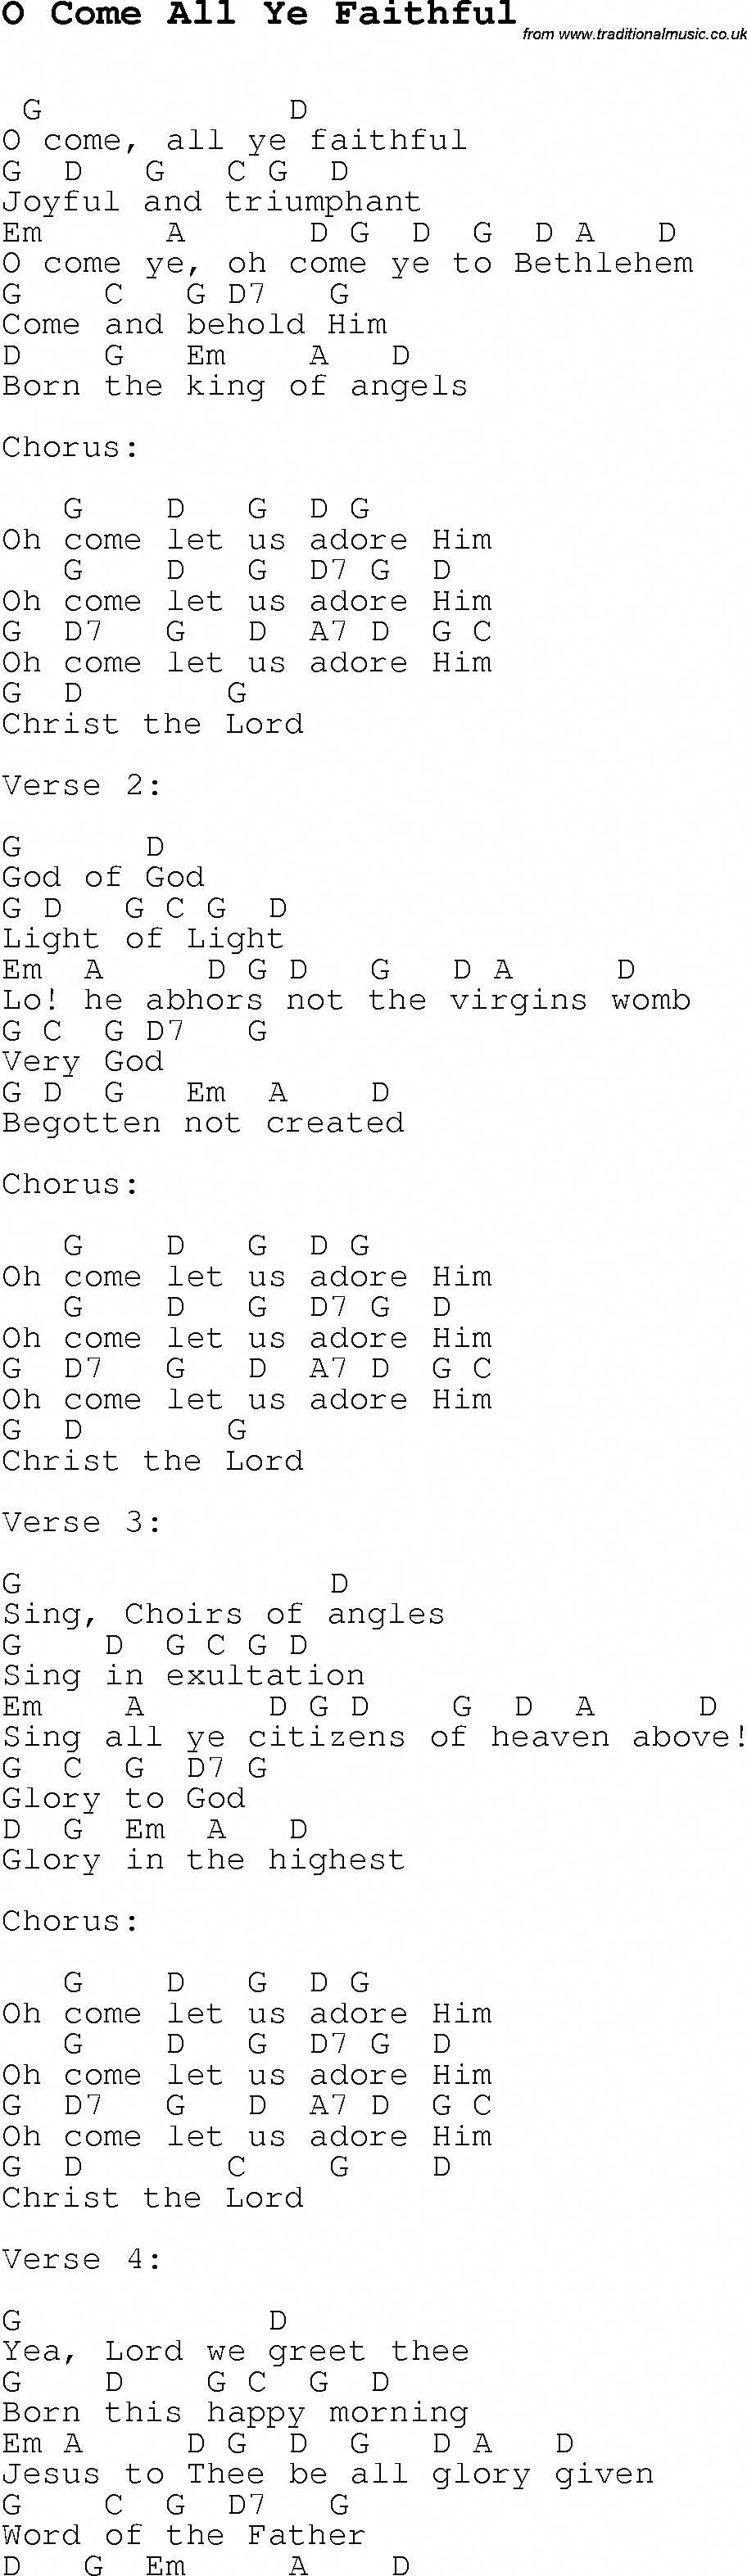 Christmas Carol O Christmas Tree (O Tannenbaum) Piano